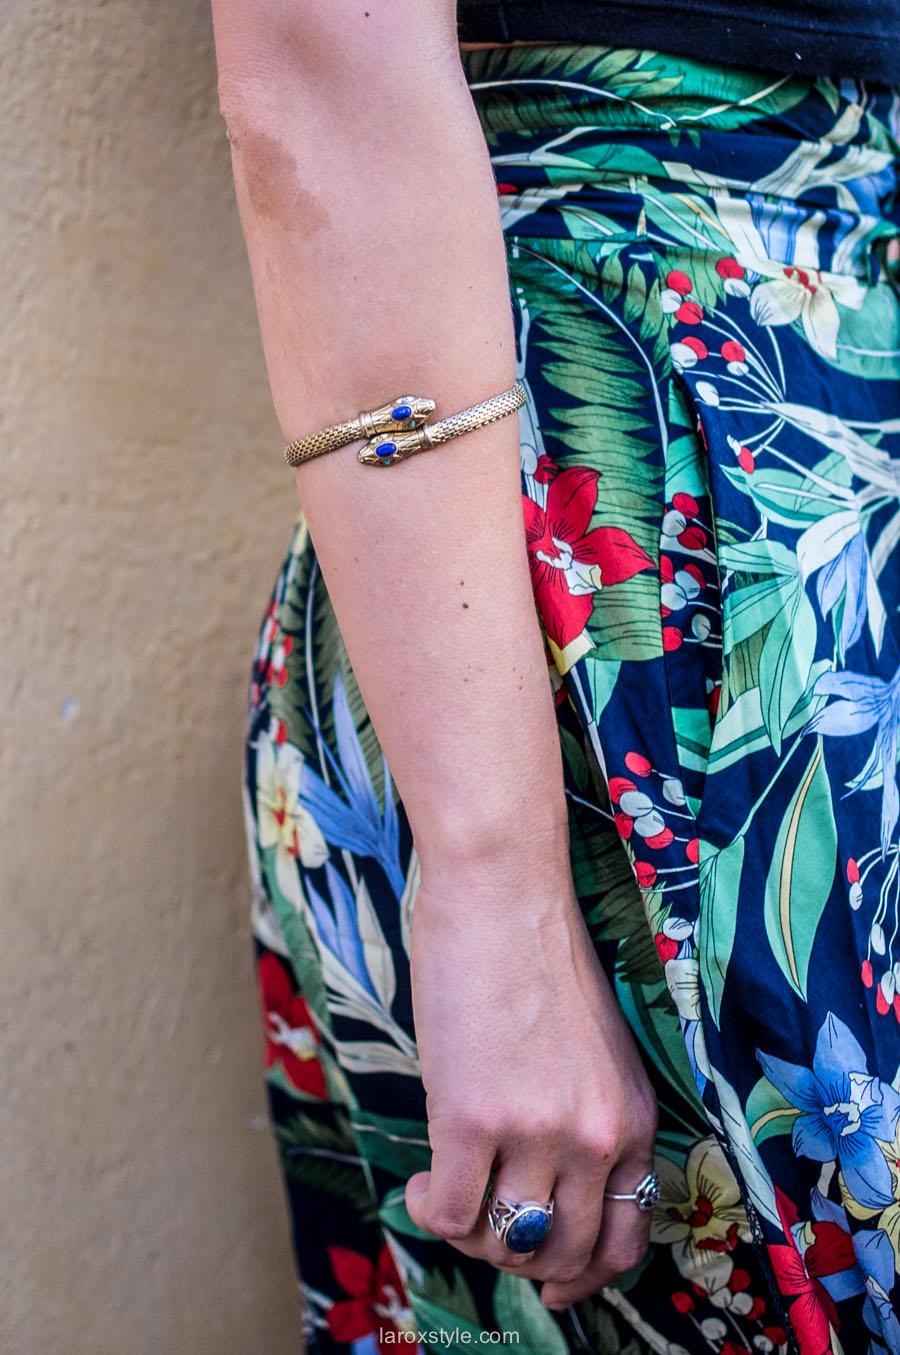 bracelet de bras - bracelet serpent